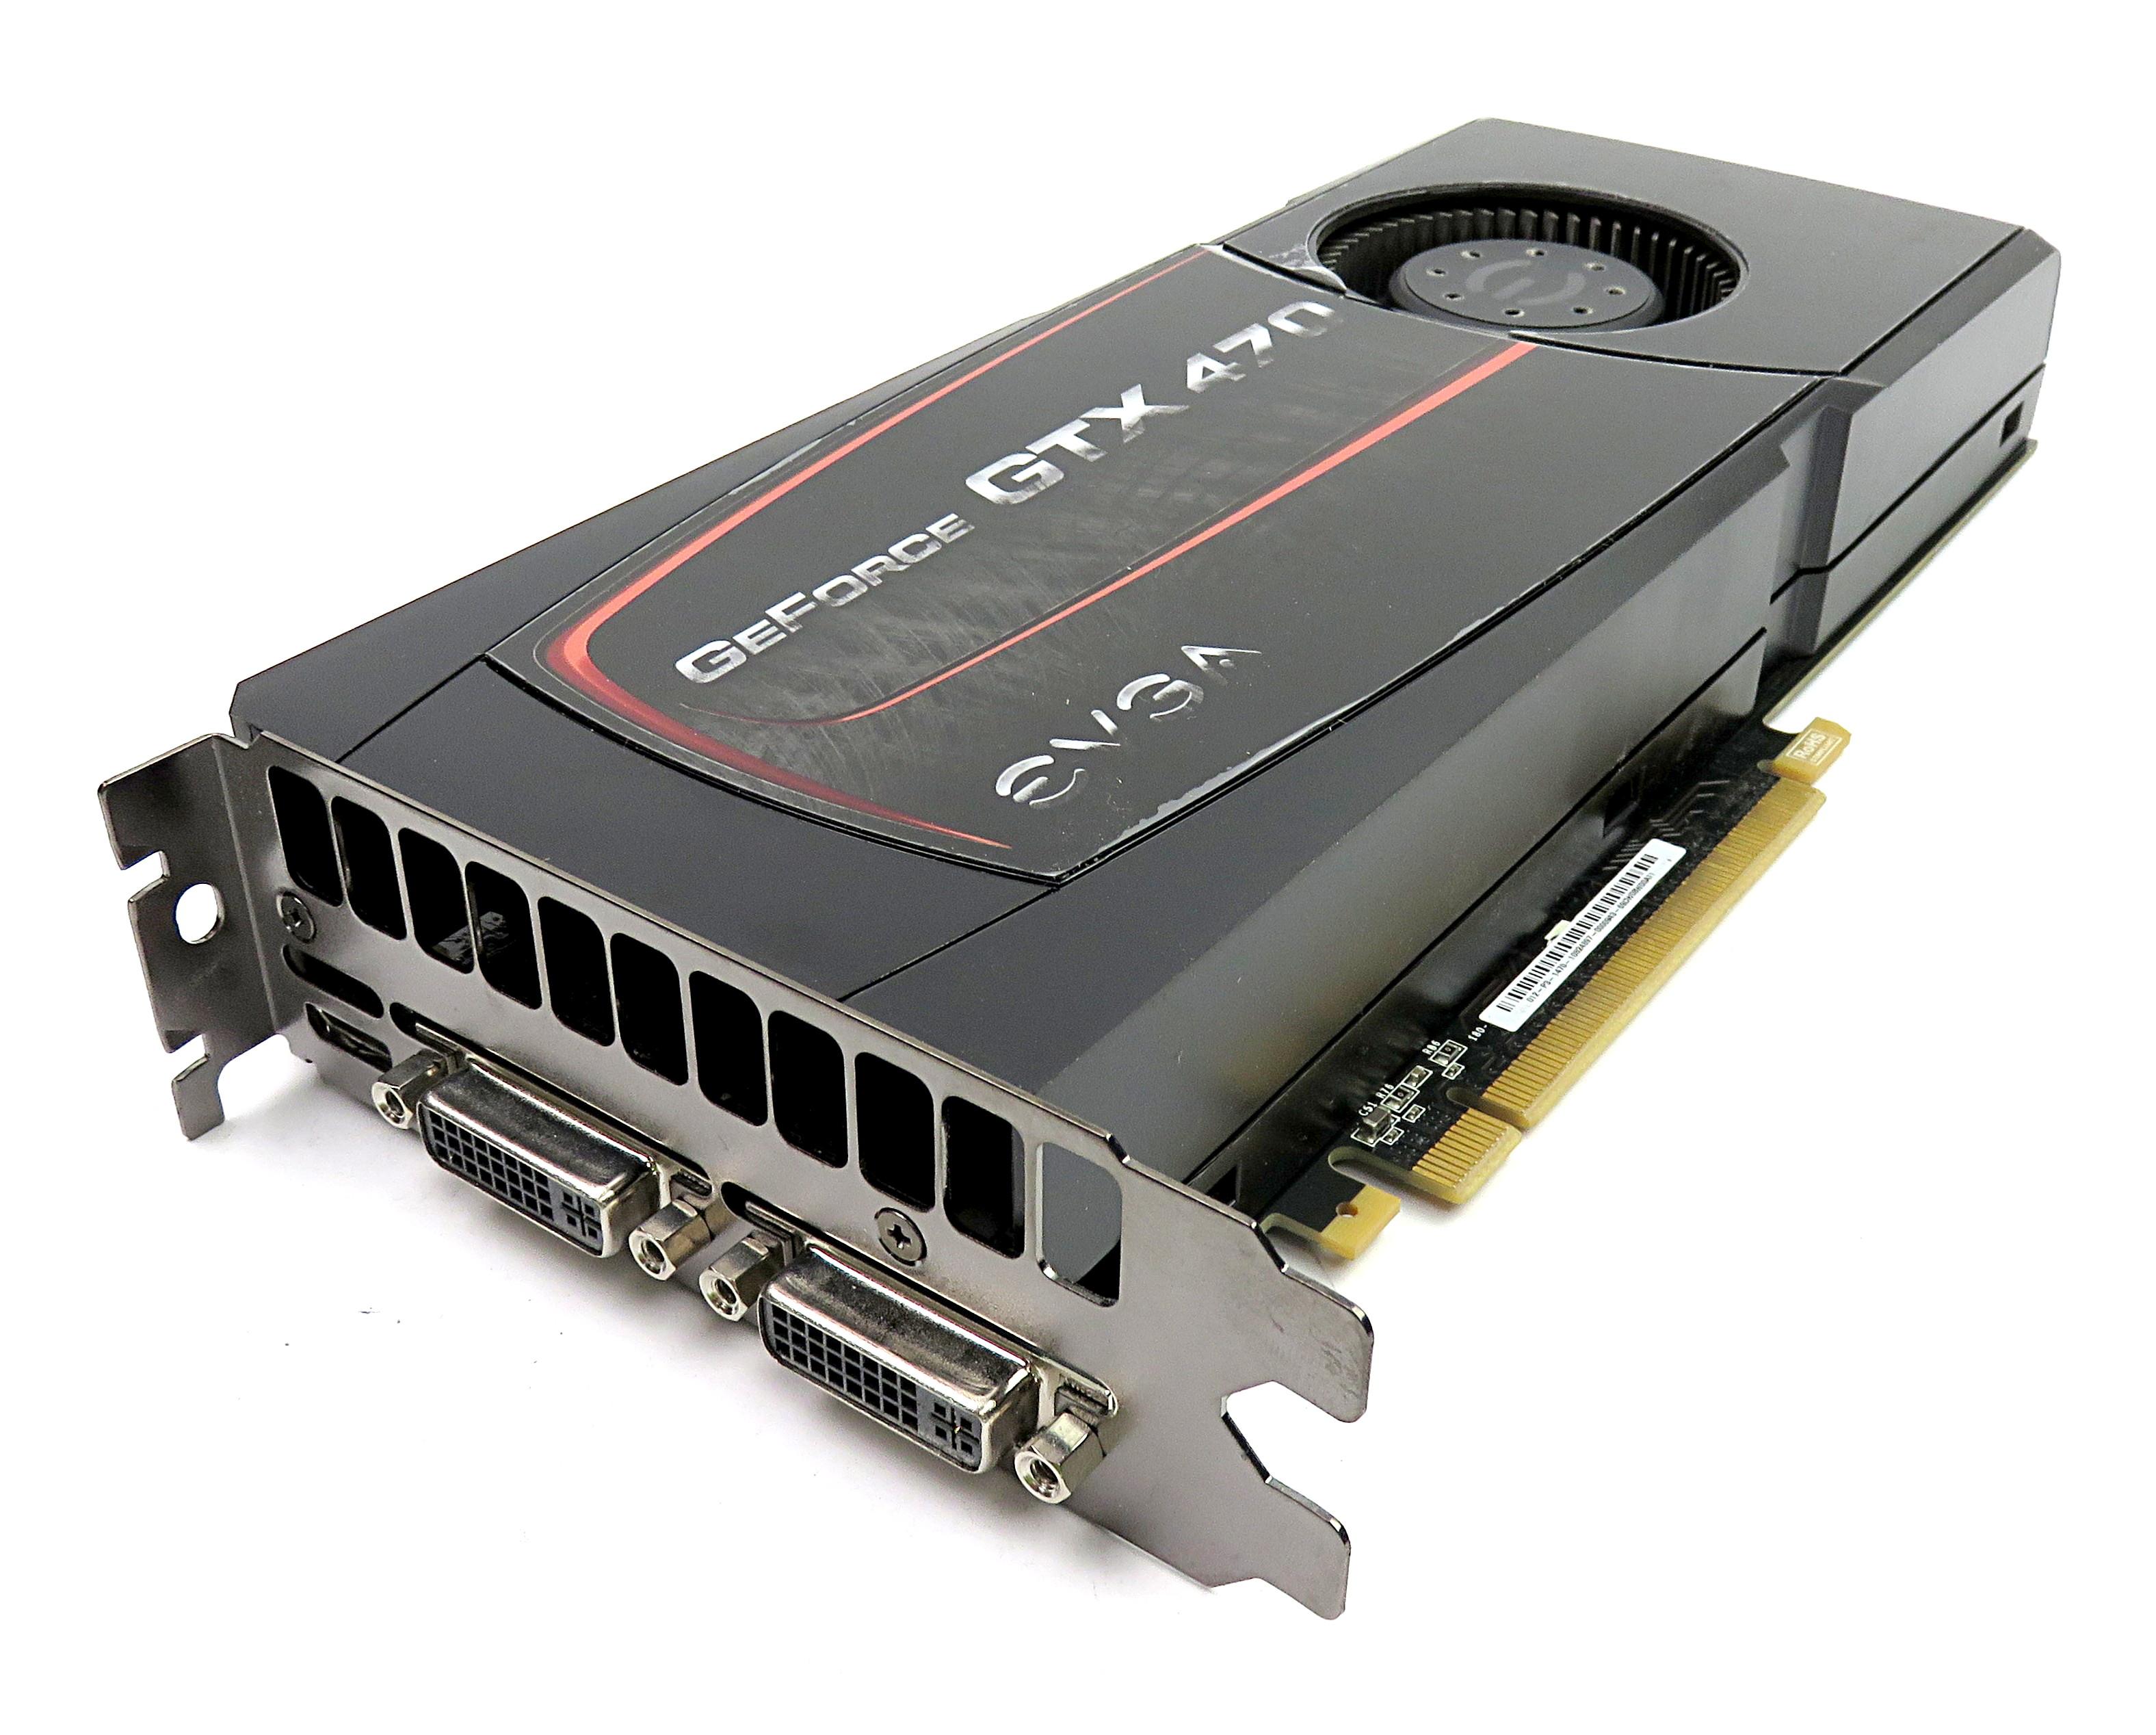 Details about EVGA nVidia GTX 470 1280MB GDDR5 Graphics Card 012-P3-1470-ER  mHDMI/2xDVI